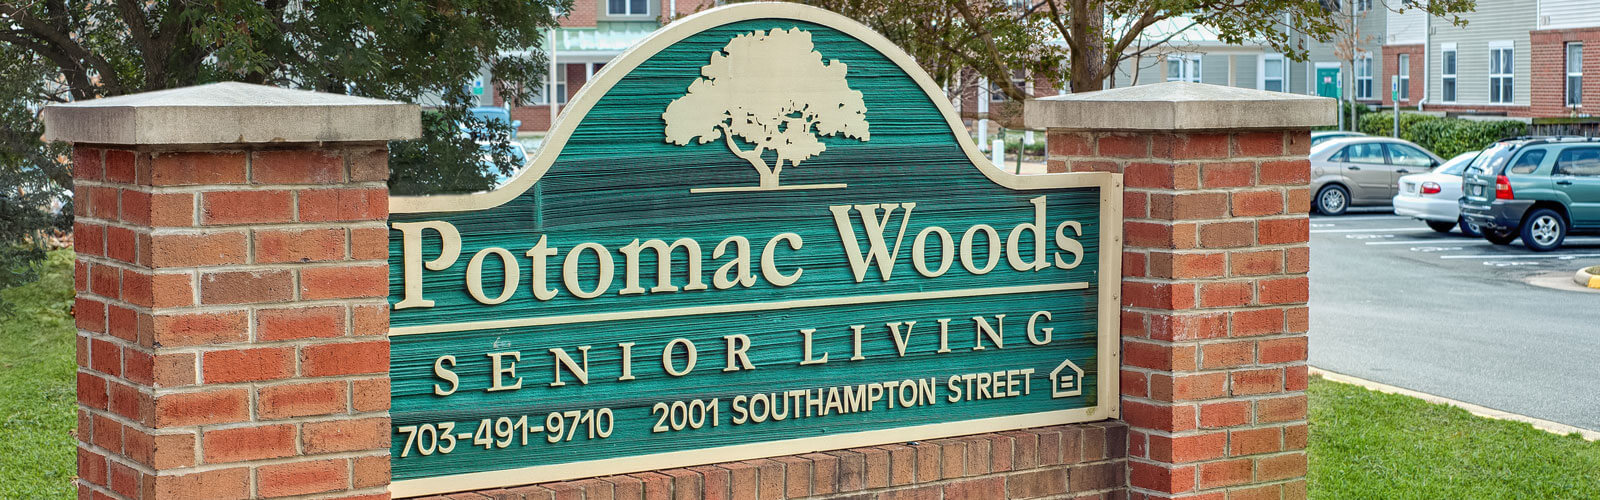 Potomac Woods Senior Living - Affordable Community